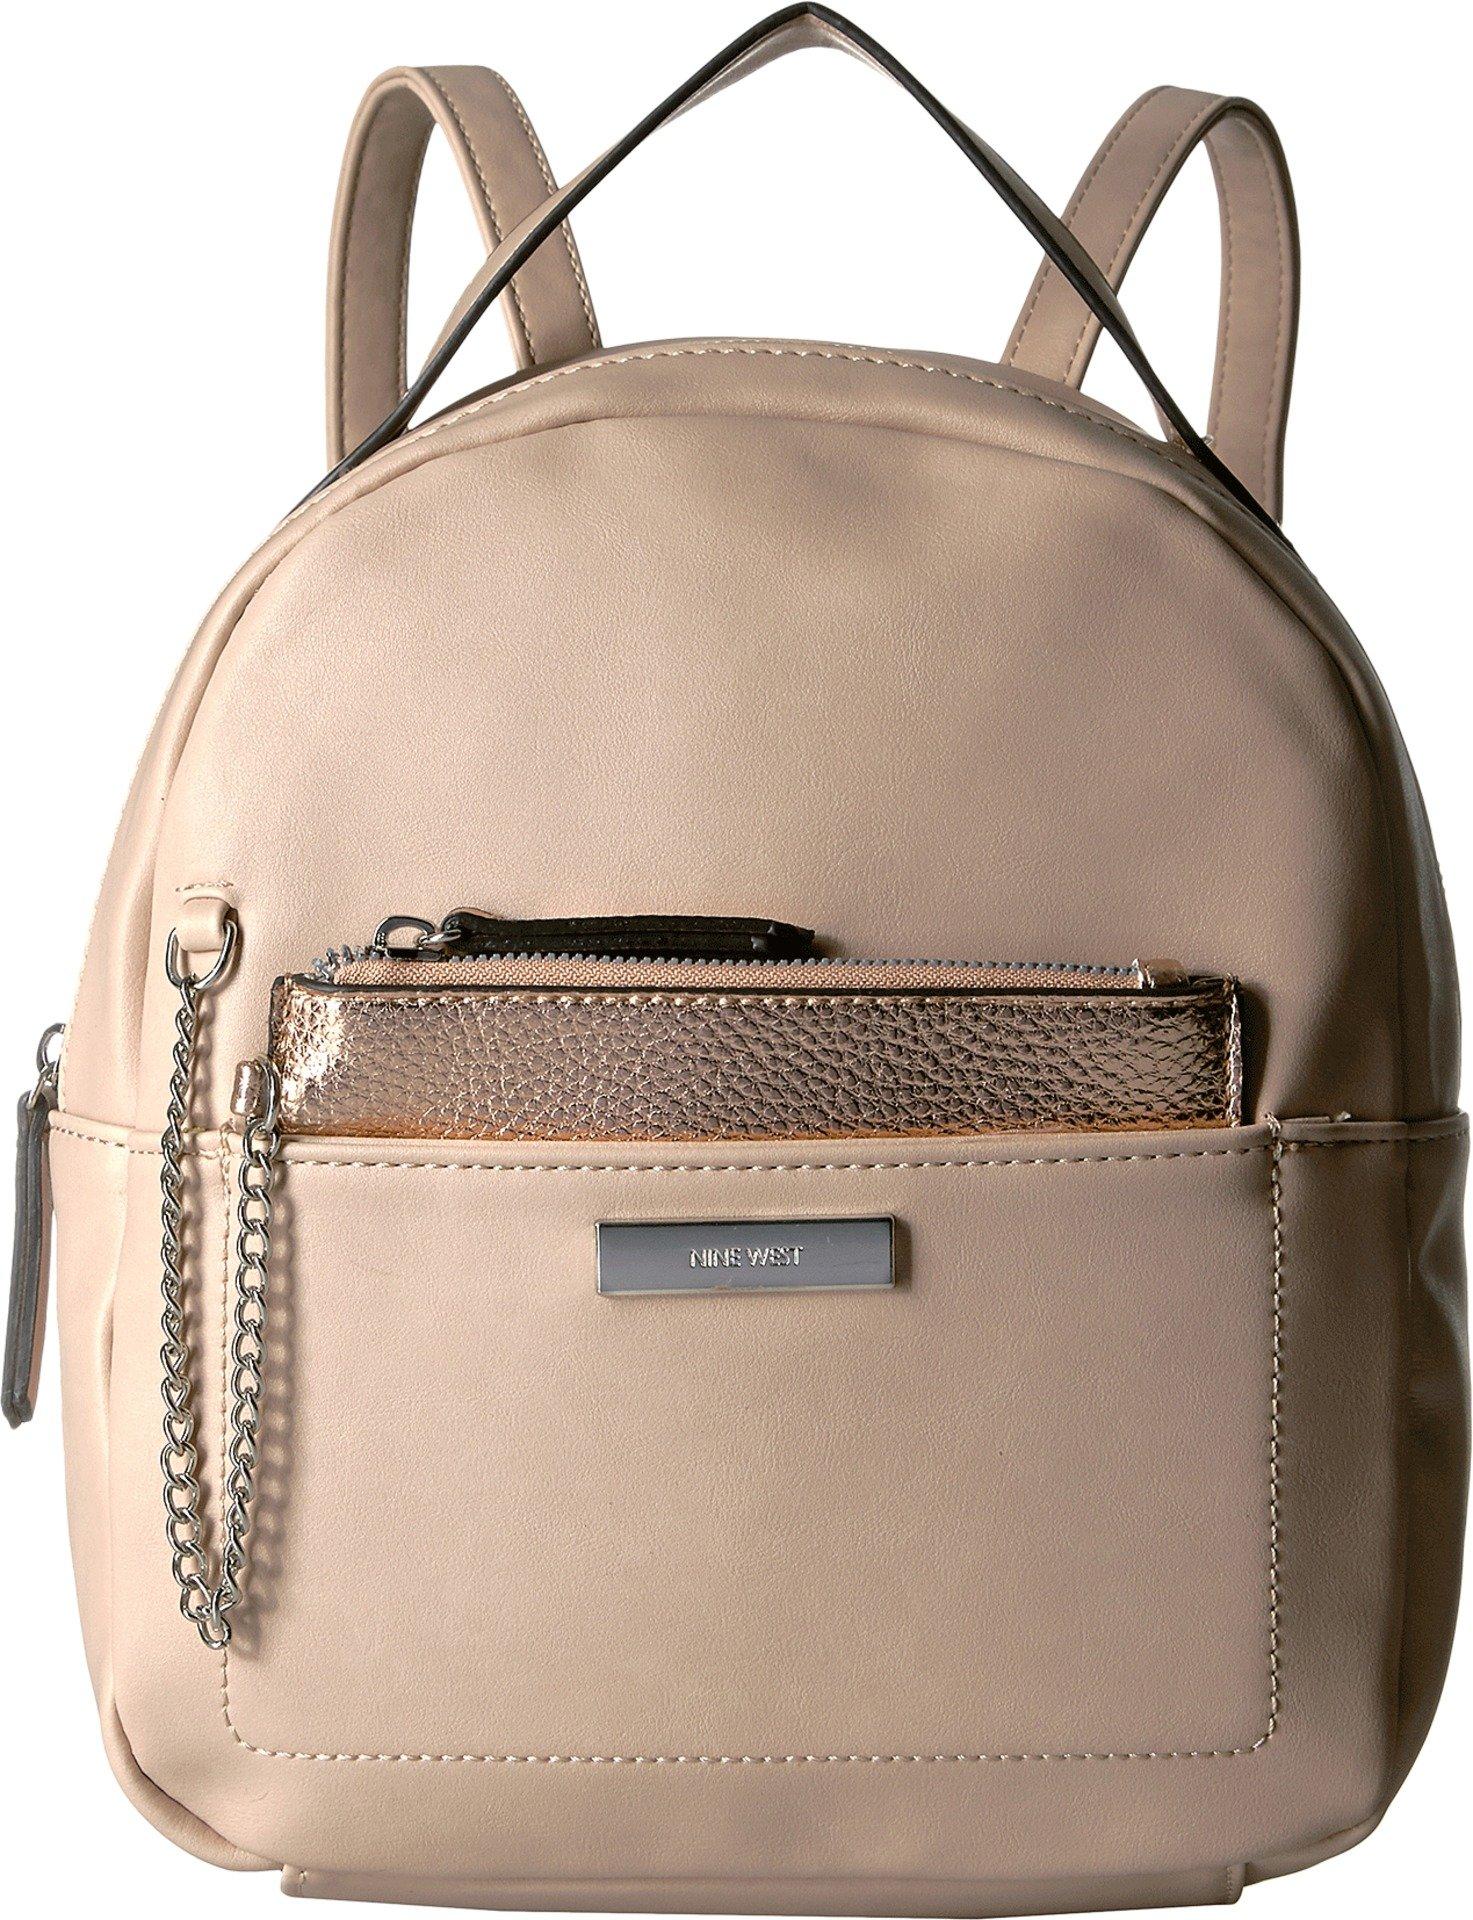 Nine West Women's Tanaya Backpack Cashmere/Metallic Rose Gold One Size